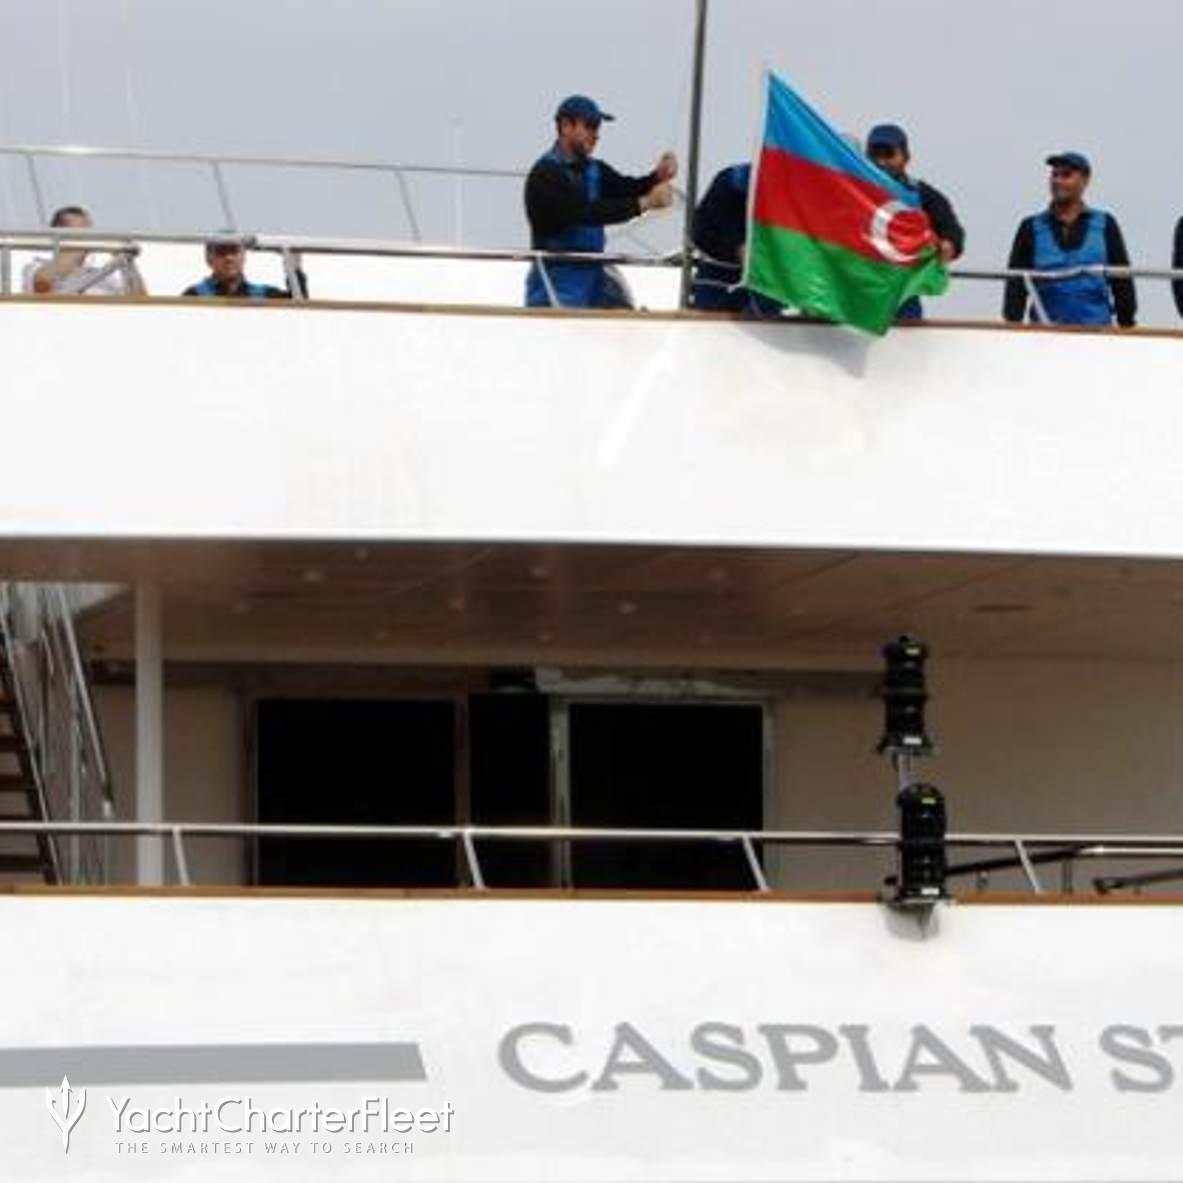 Caspian Star photo 5